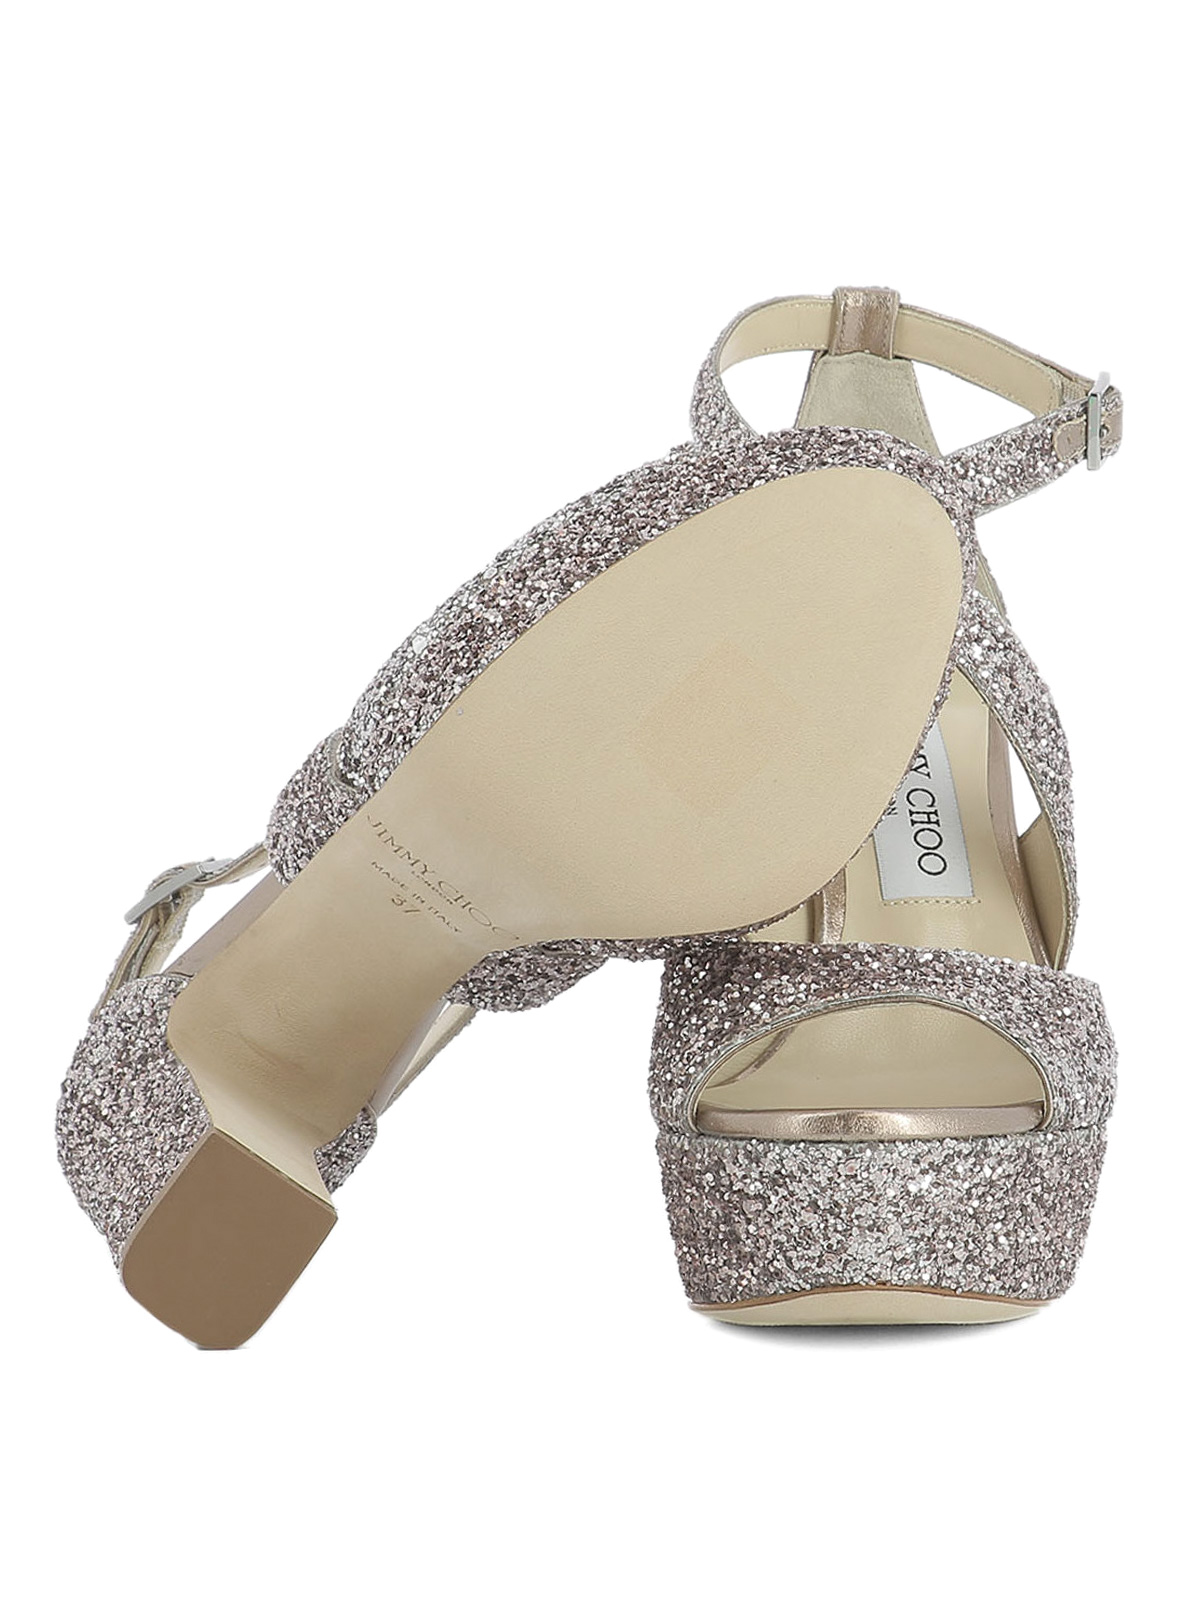 b27e216e4cf5 Jimmy Choo - April 120 glitter sandals - sandals - APRIL120XLCTEAROSE